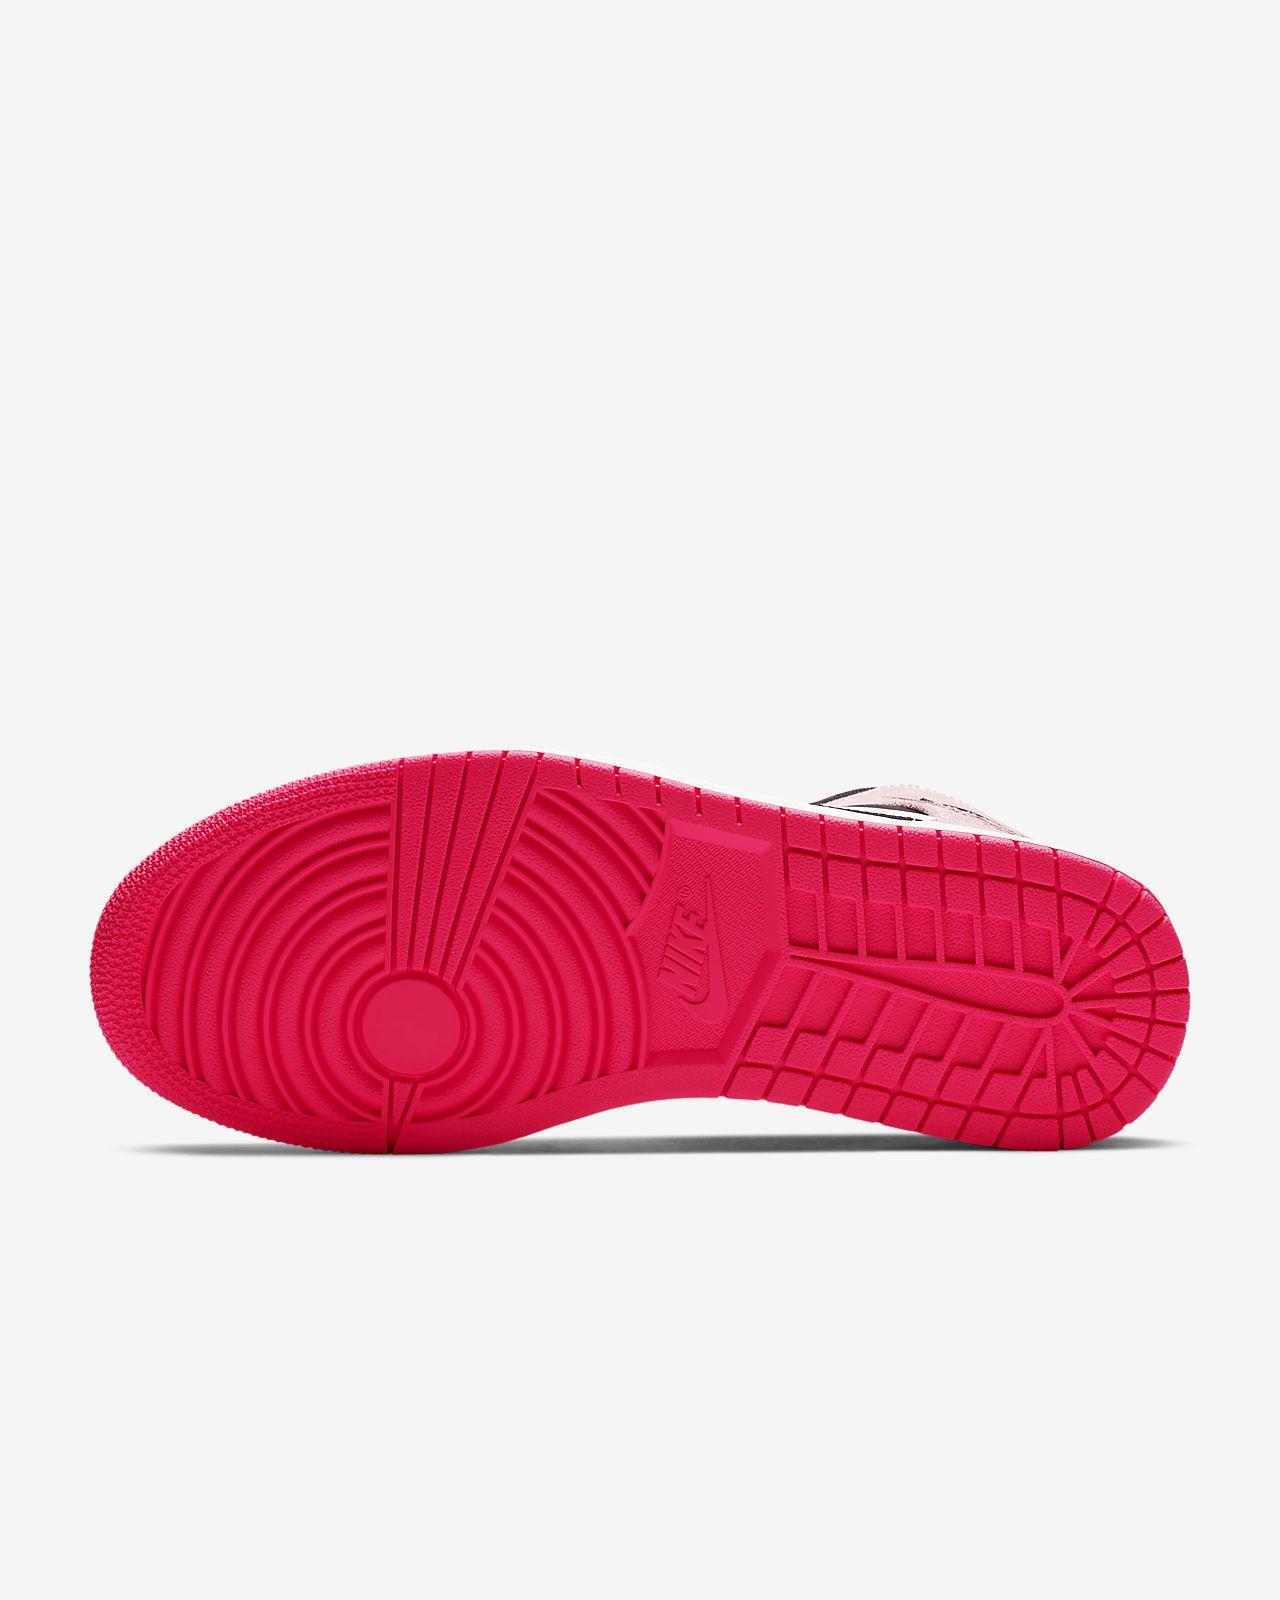 san francisco 54aef 6c899 ... Air Jordan 1 Mid SE Men s Shoe